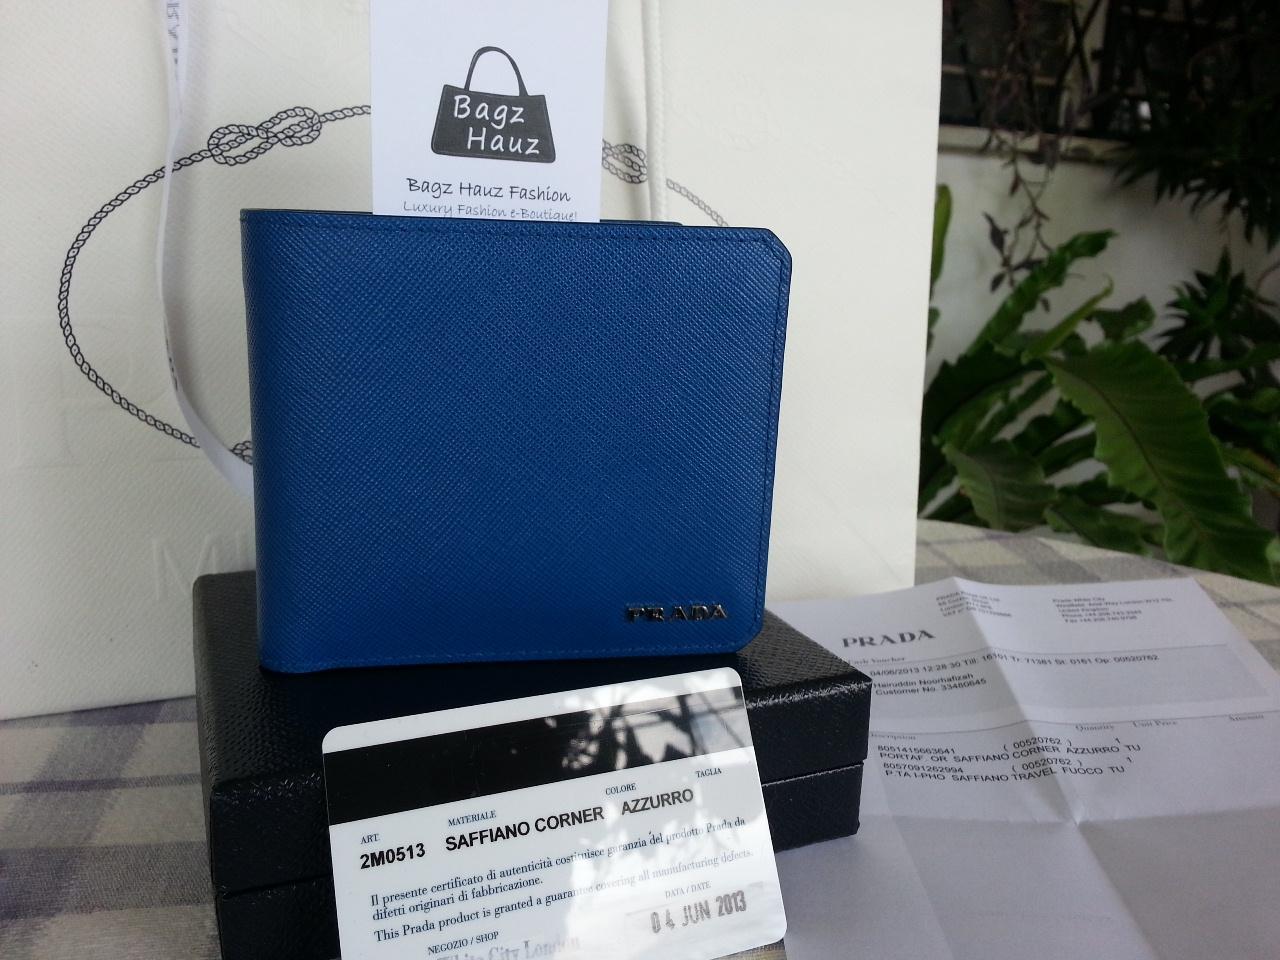 d8e88c251ea3 PRADA 2M0513 Saffiano Leather Wallet in Azzurro ~ On behalf of AN ~